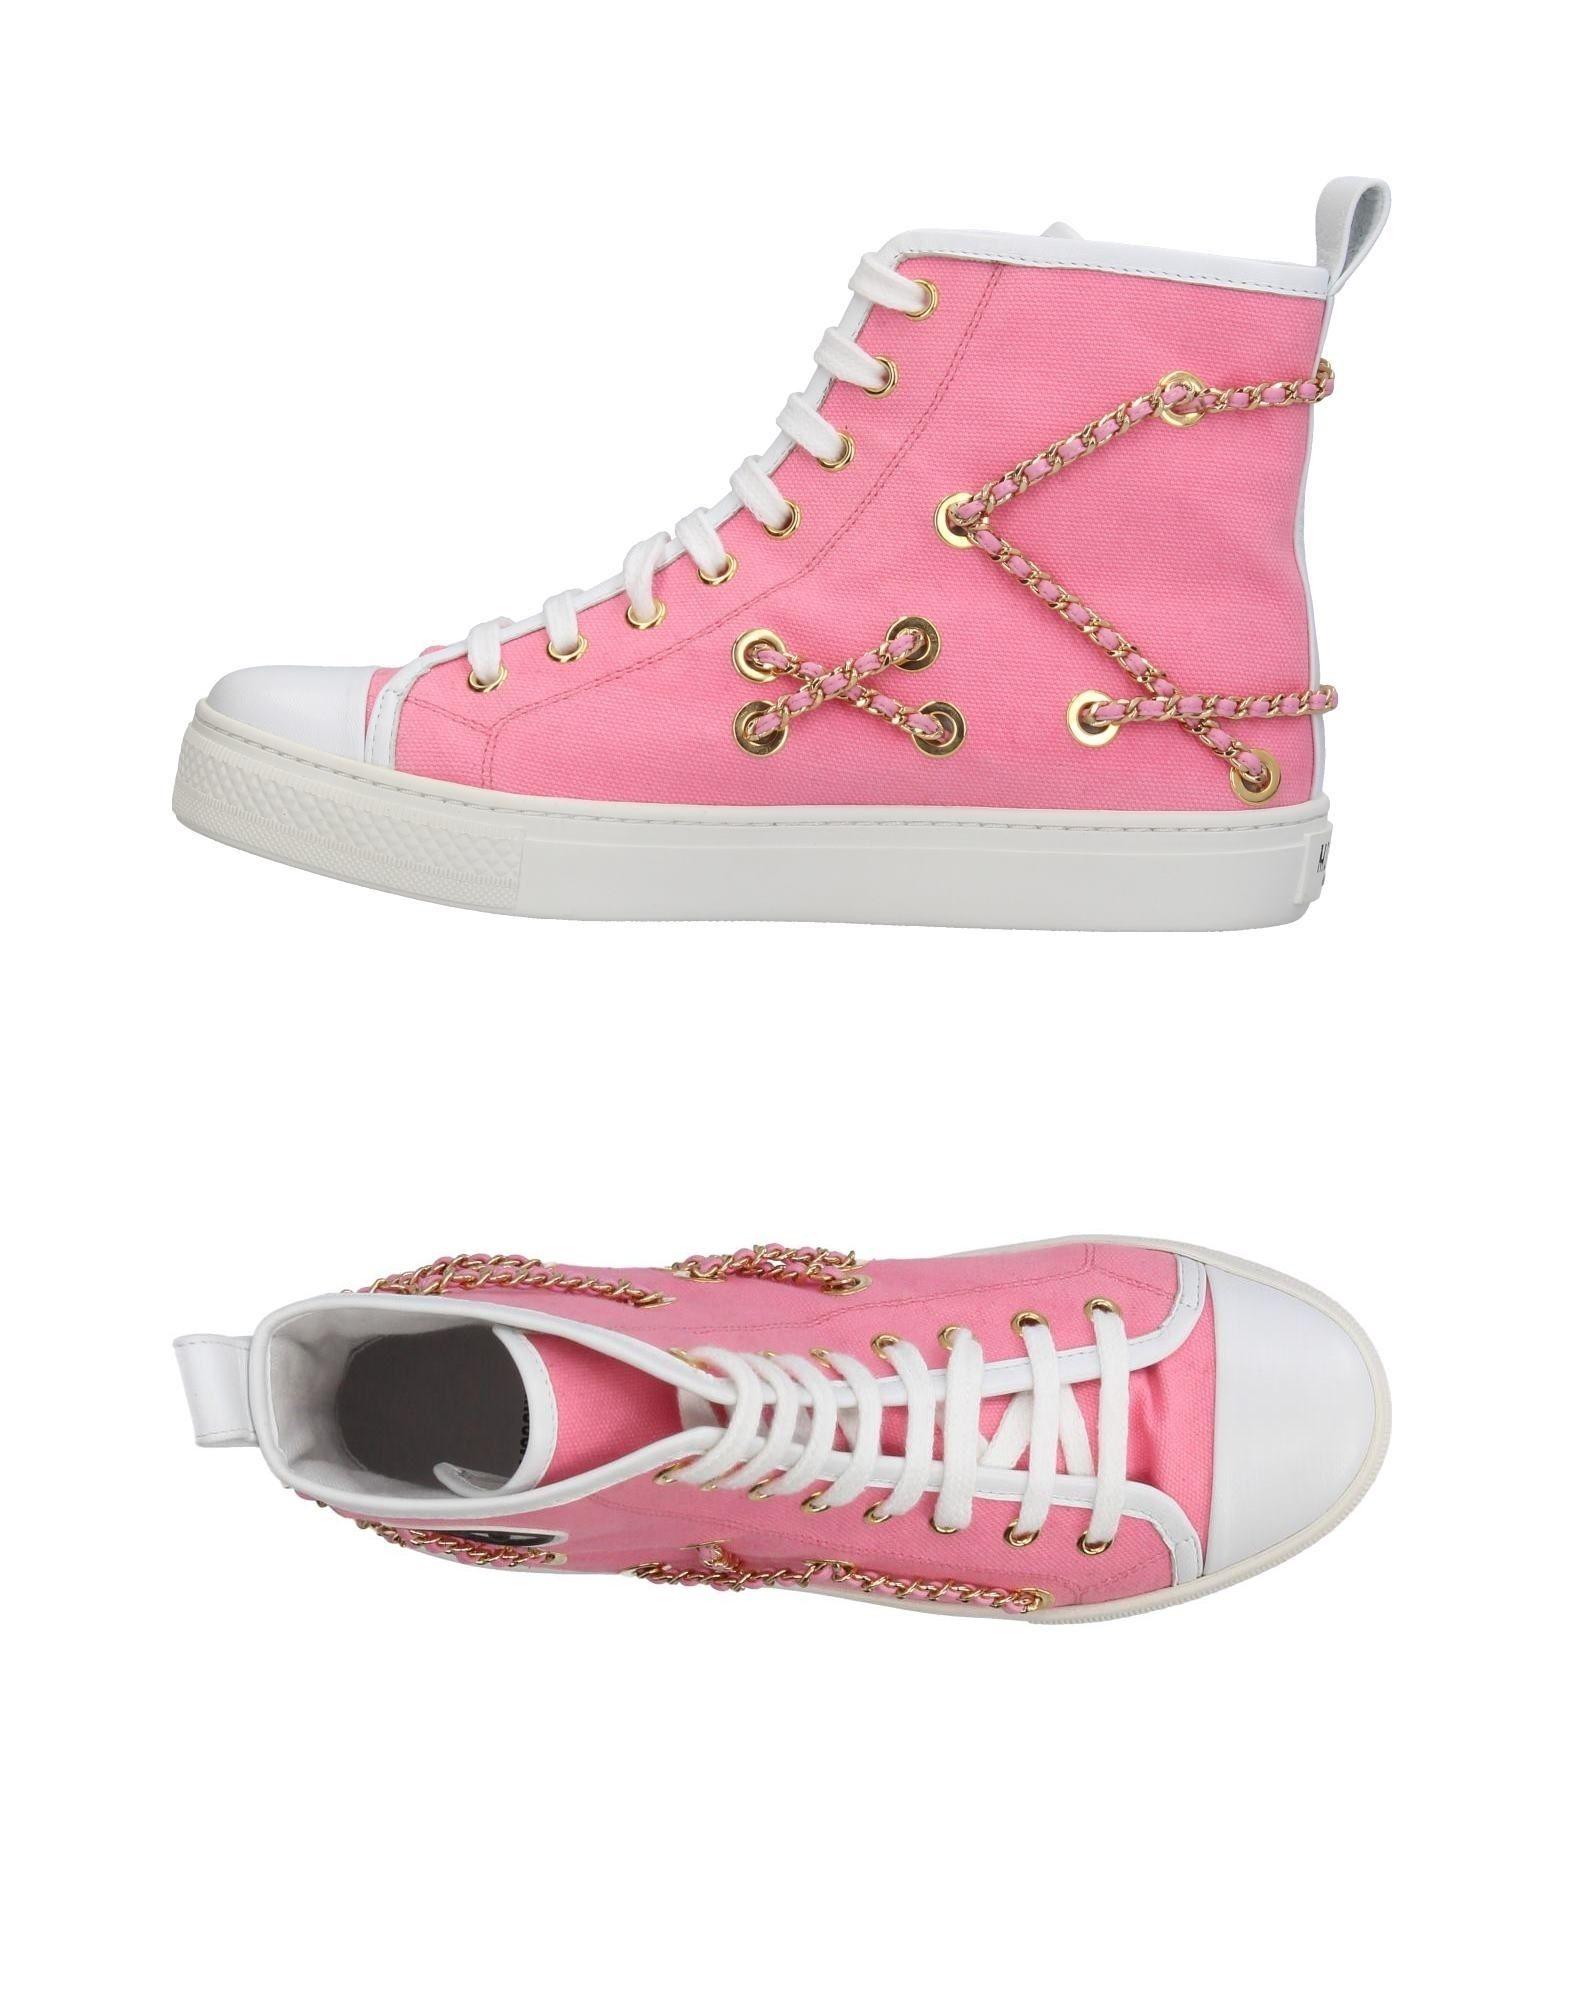 Moda Sneakers Sneakers Moda Moschino Donna - 11221521OL 0056e1